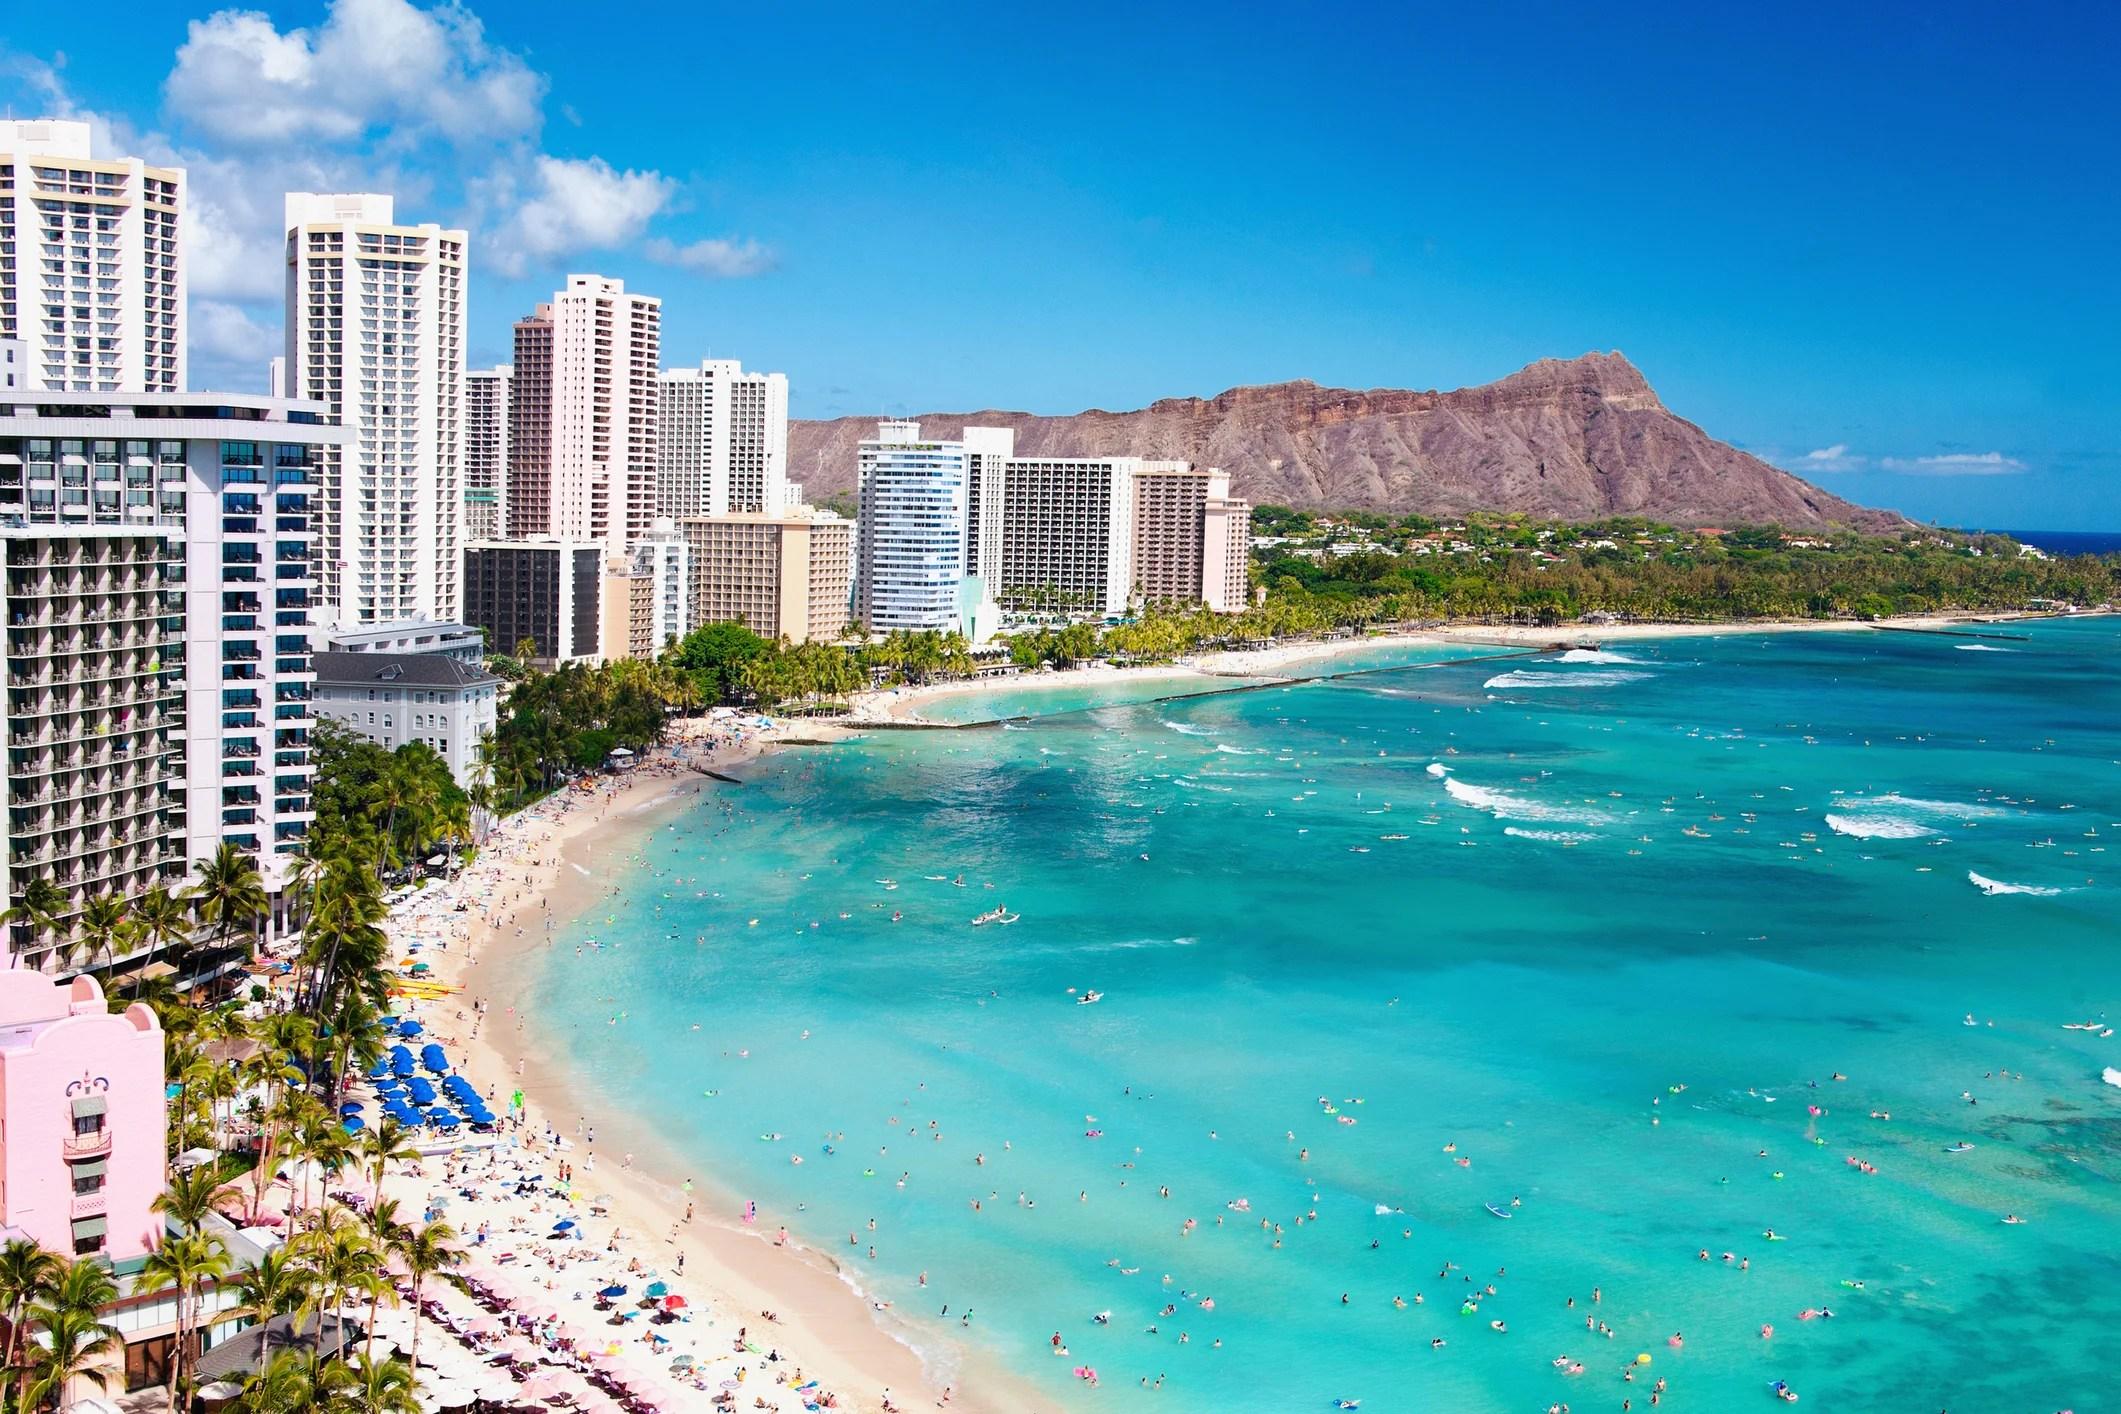 Deal Alert: Flights to Hawaii From $355 Round-Trip